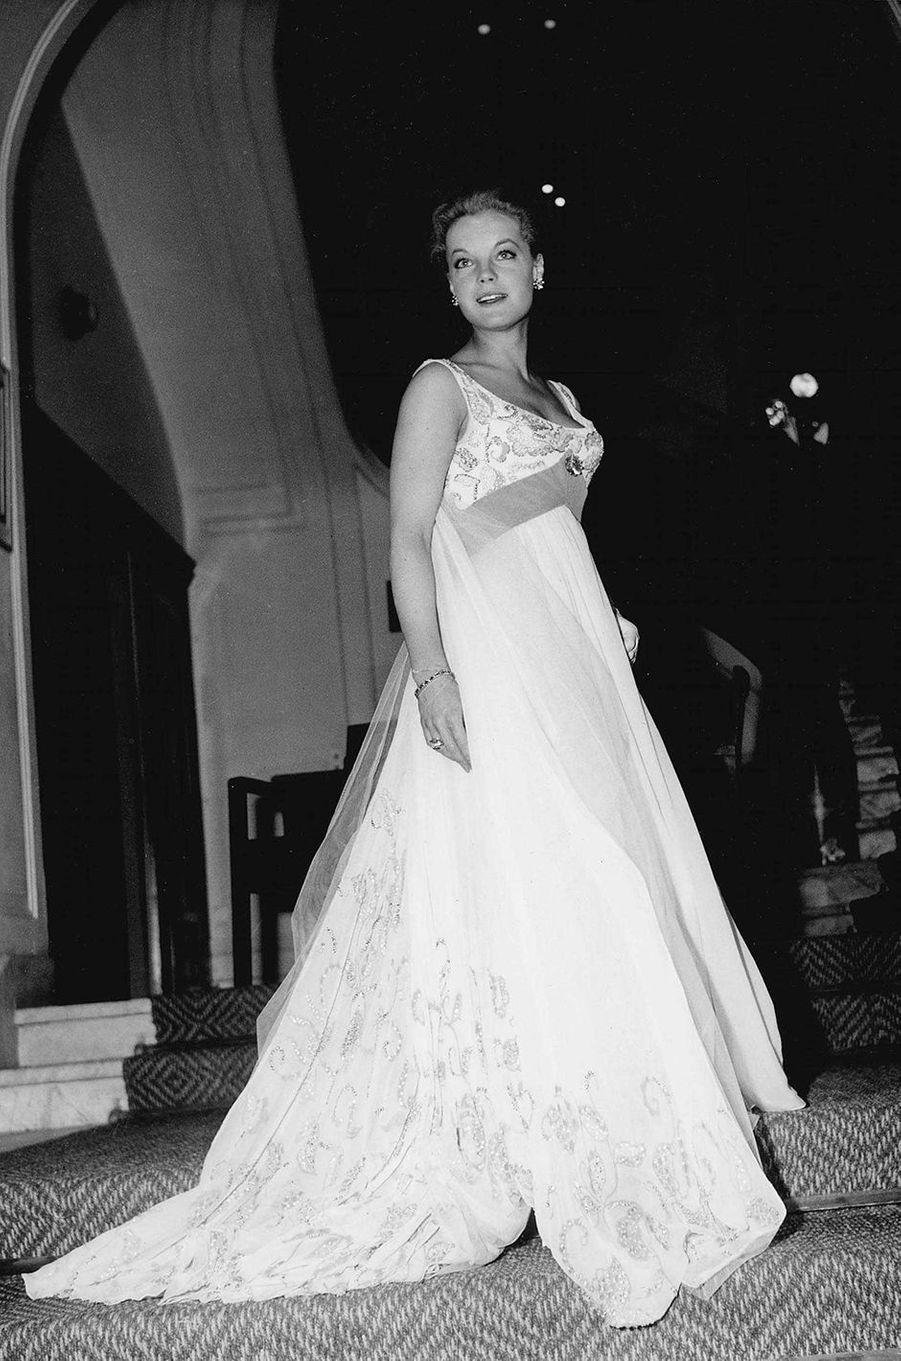 Romy Schneider au festival de Cannes en 1959.